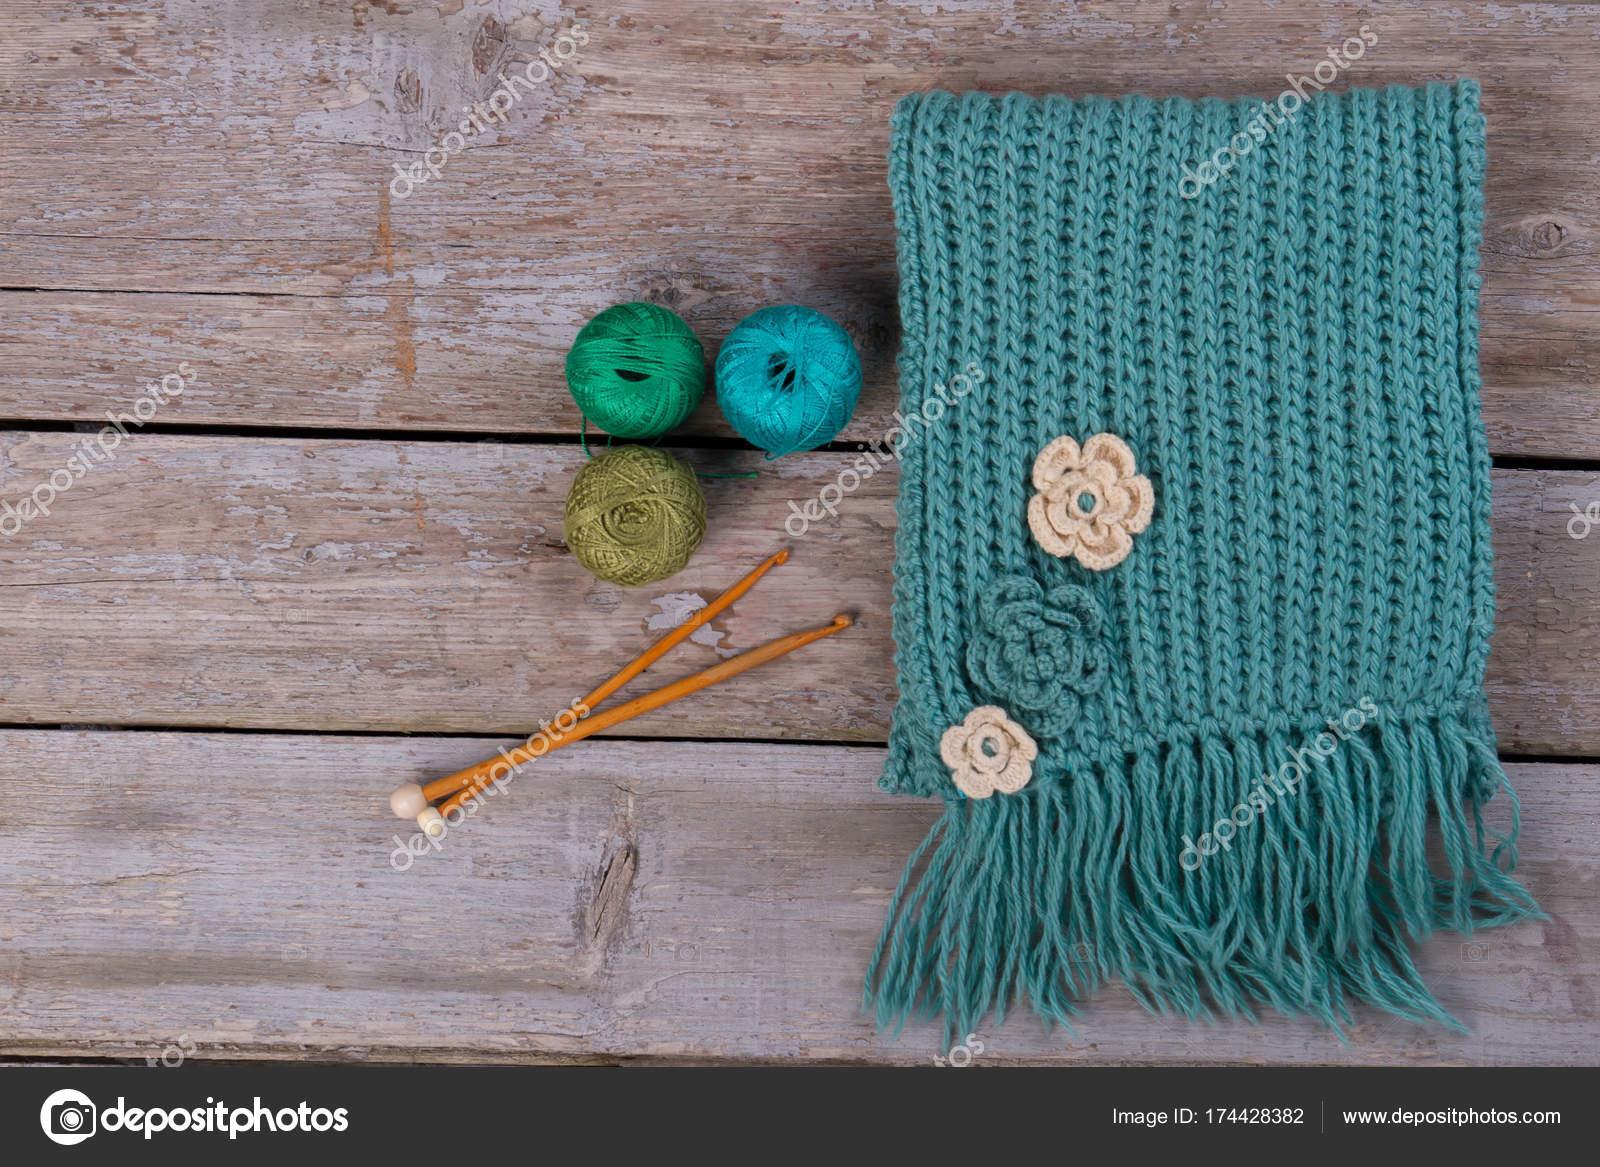 Turkooizen Sjaal Met Bloem Ornament Stockfoto Margostock 174428382